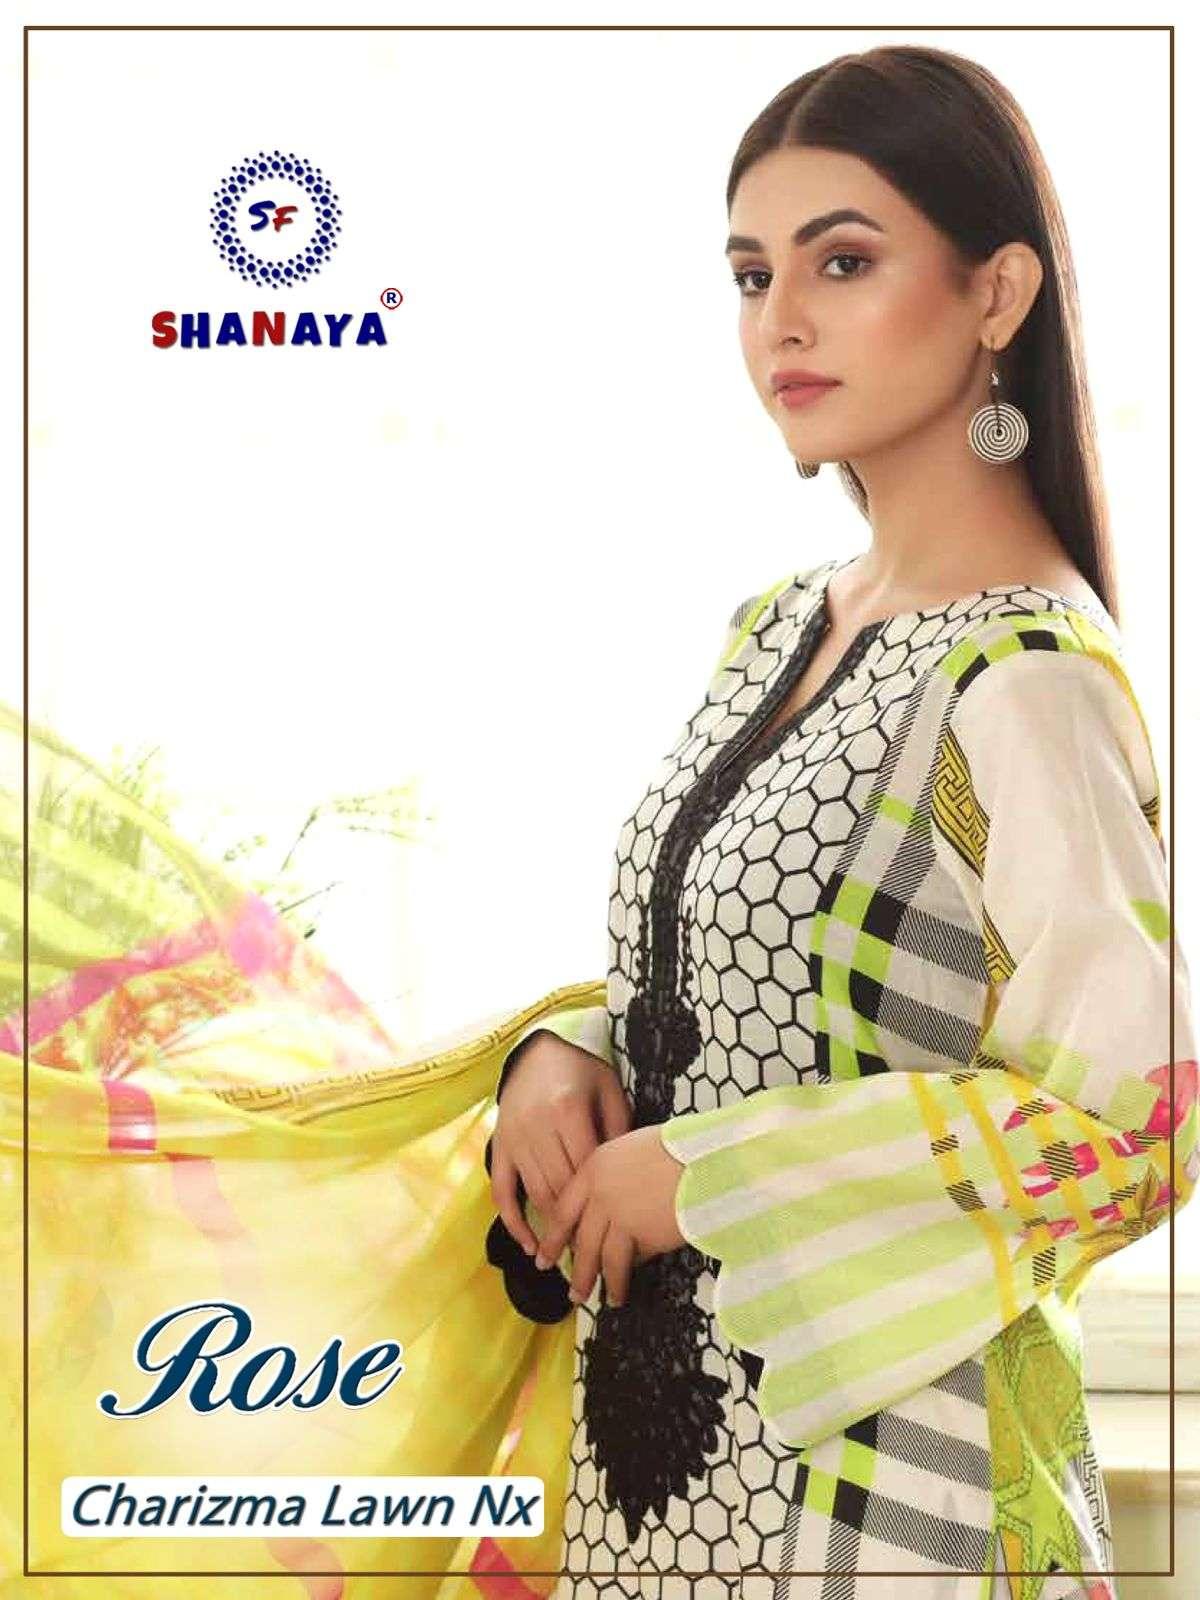 Shanaya Rose Charizma Lawn NX pakistani Suit Design at Best rate